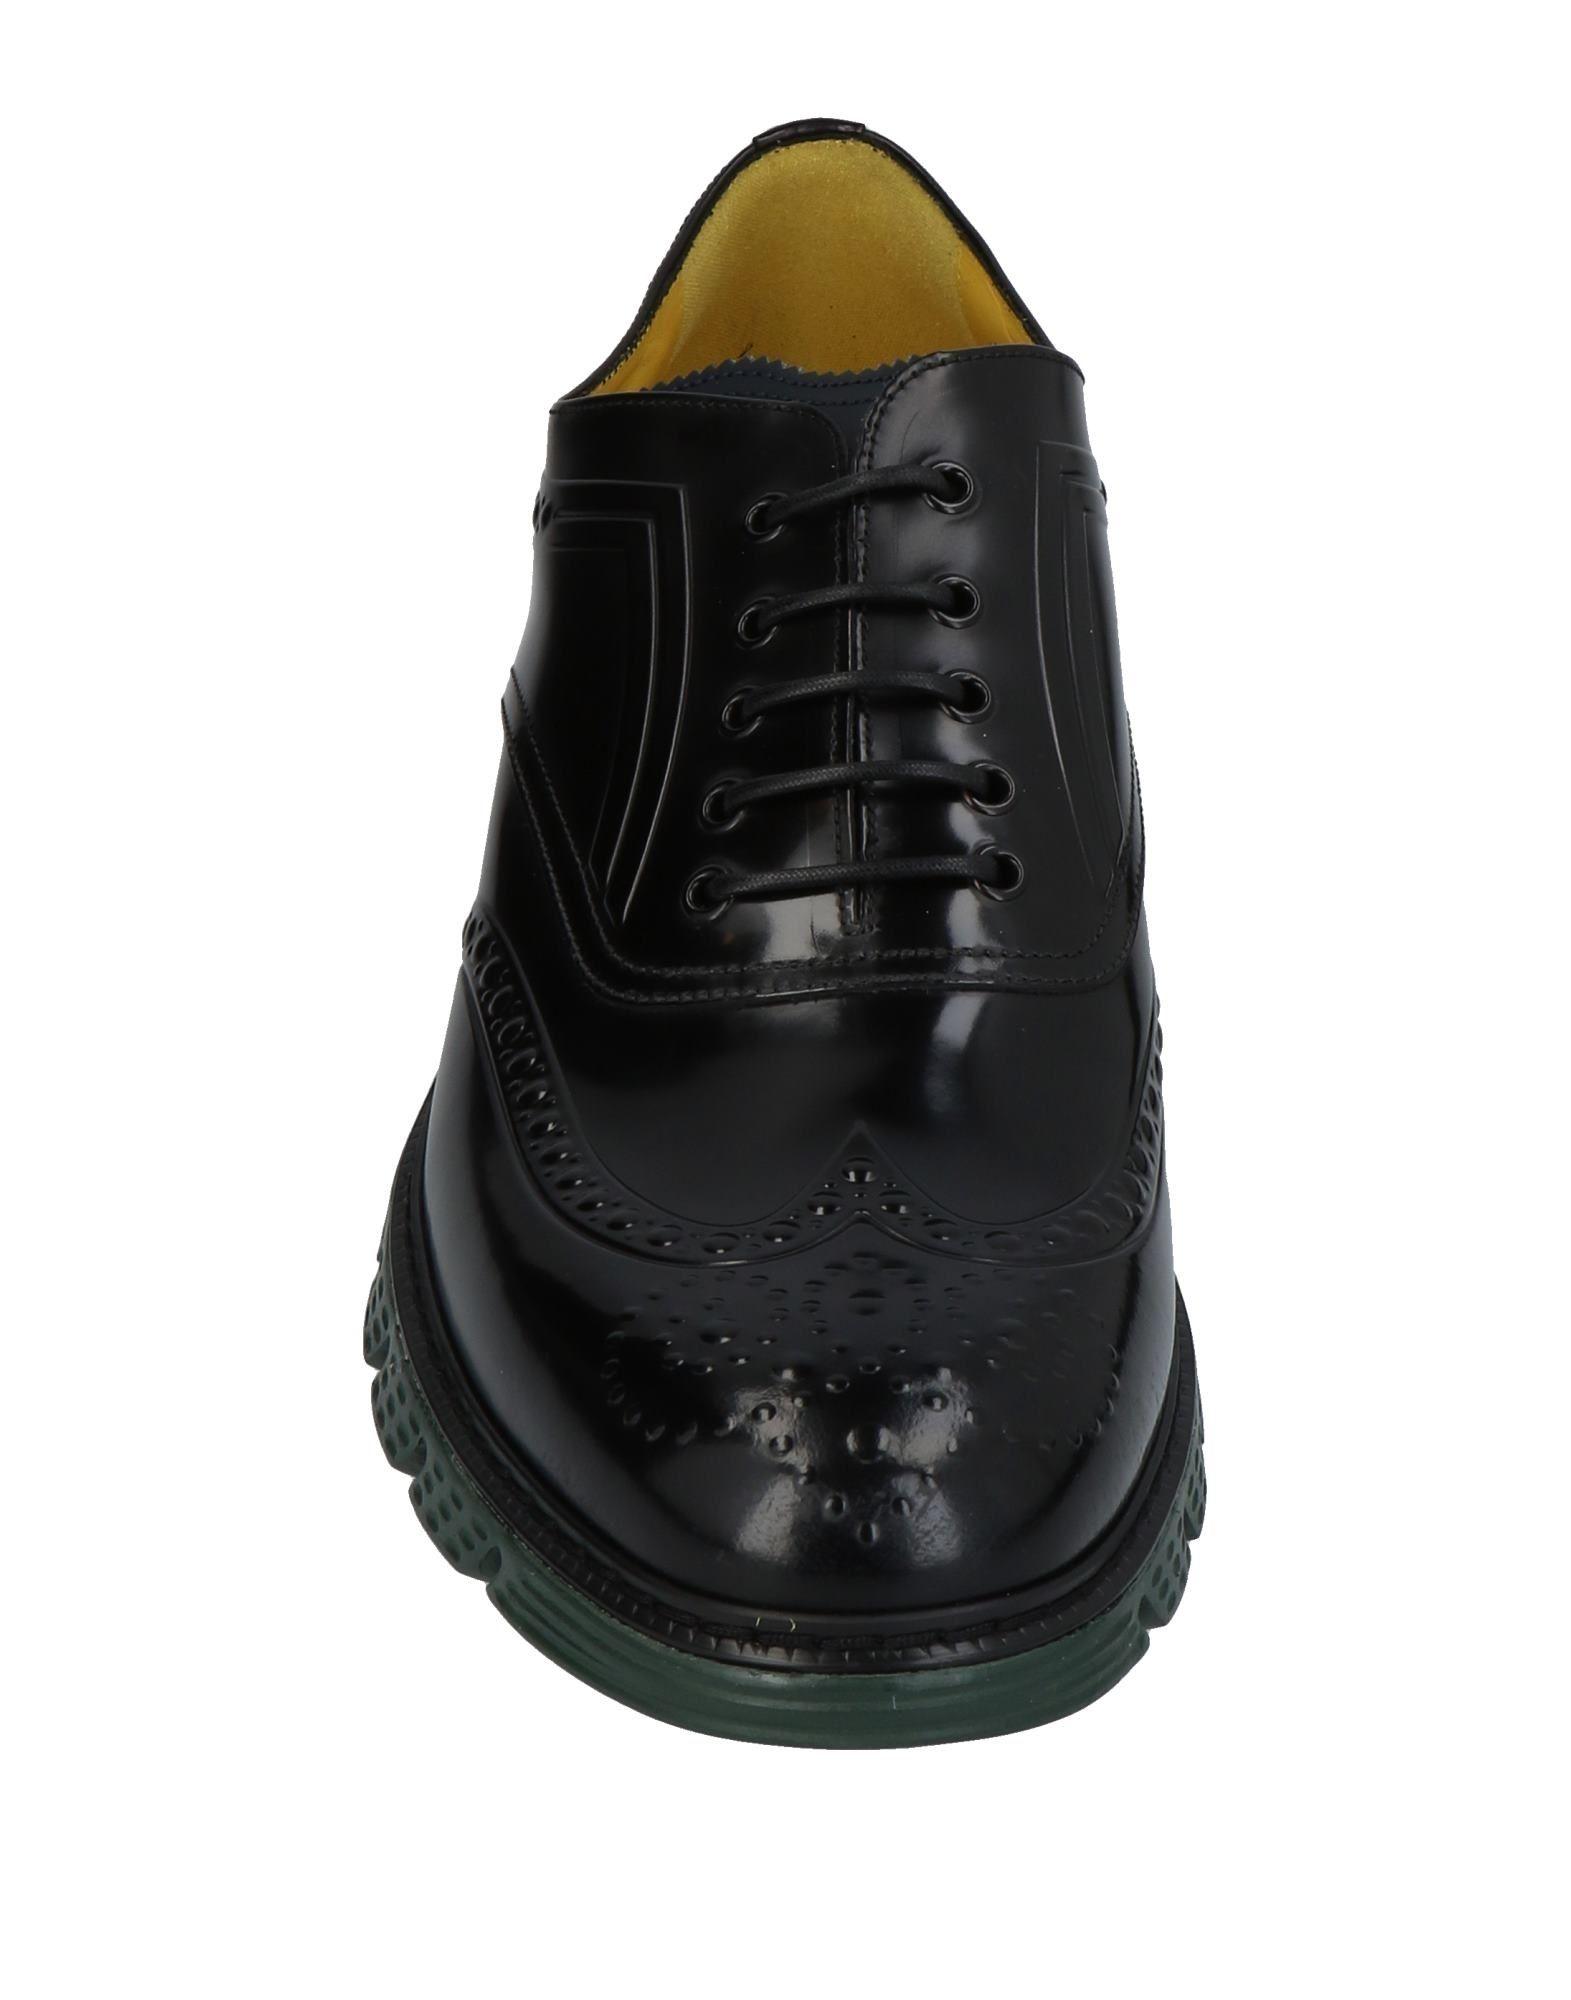 Lacets Chaussures Chaussures Lacets Homme À Barracuda Barracuda À RqRrFvwf